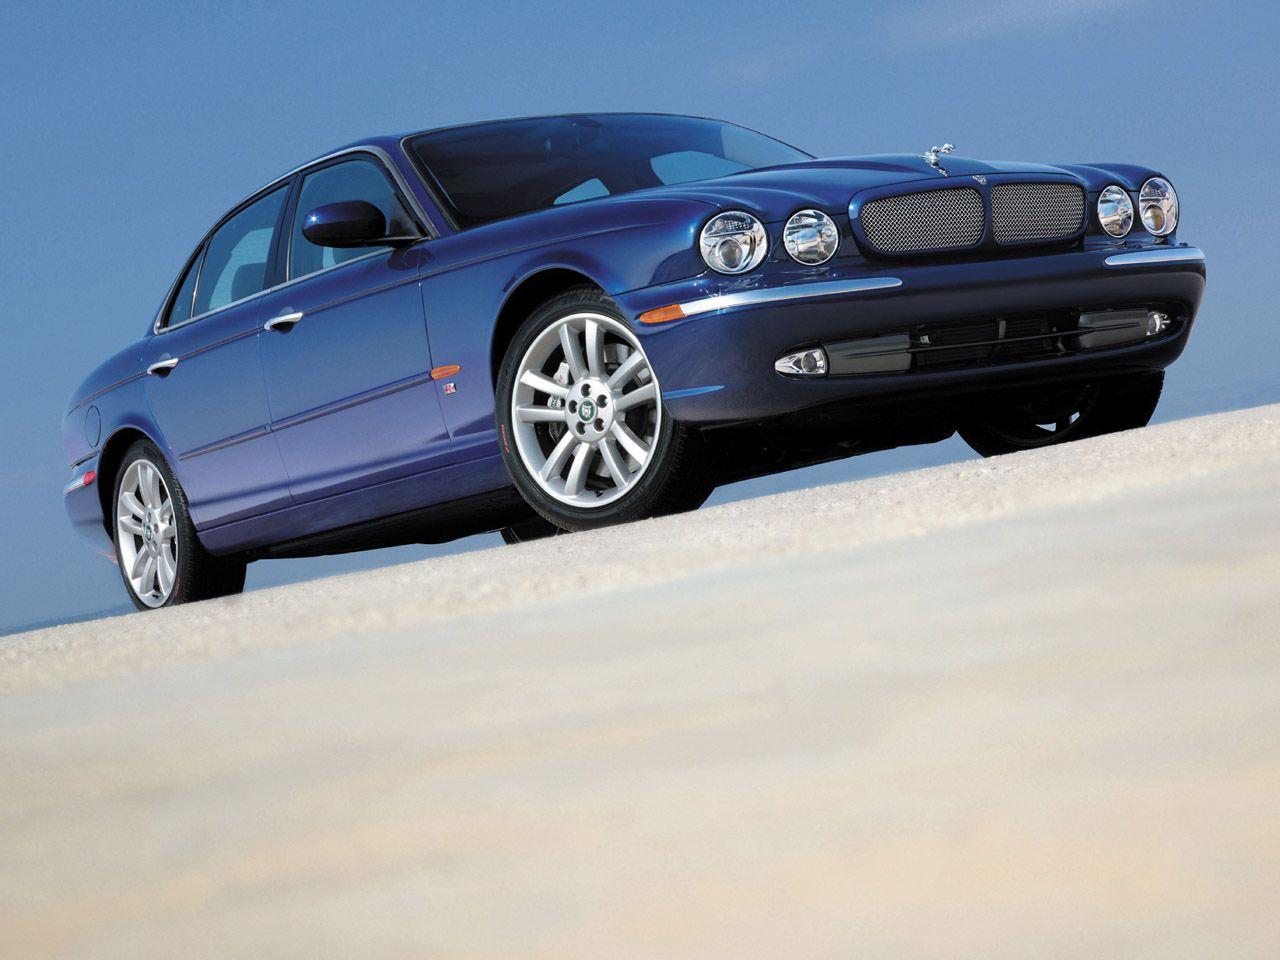 cars for classics classic jaguar on sale virginia near bedford modern car